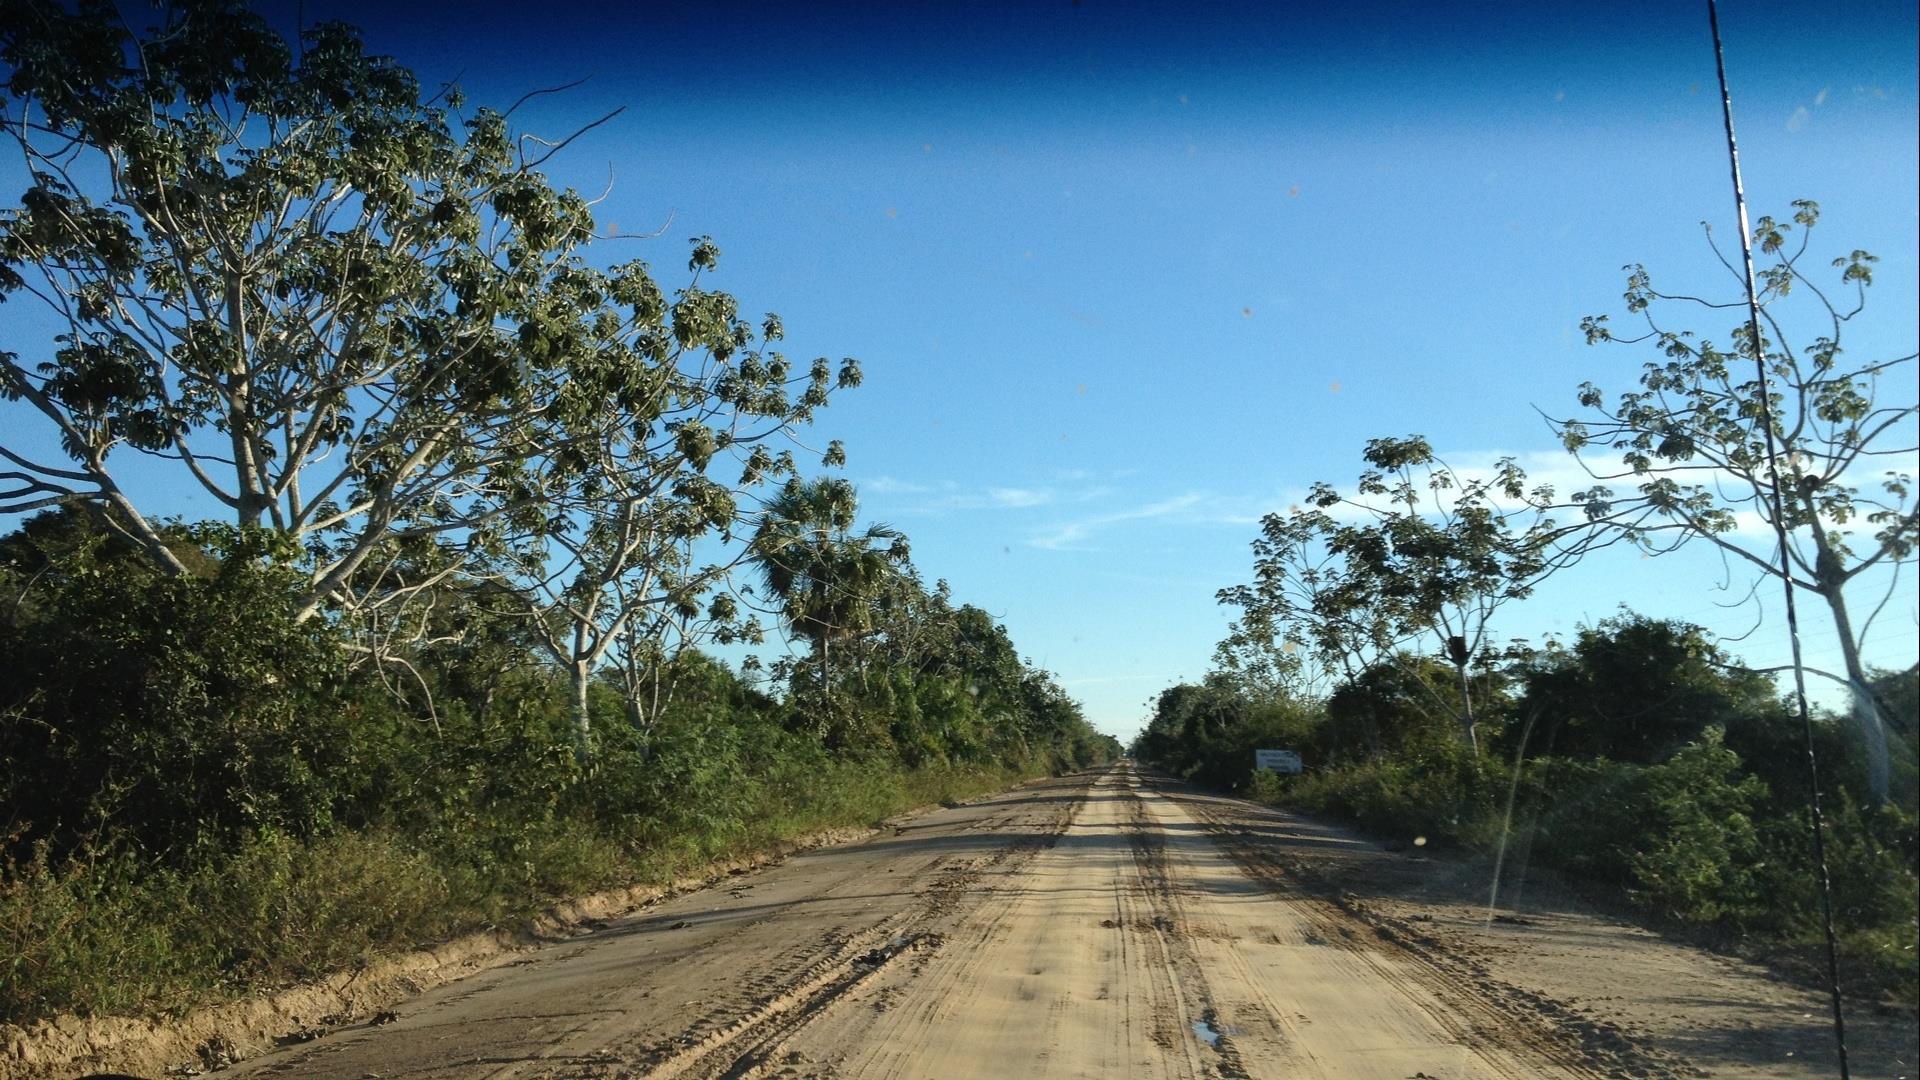 Brasilien | Campo Grande, Bonito, Pantanal: 6 Tage Reisebaustein - Mietwagenreise durch das Süd-Pantanal